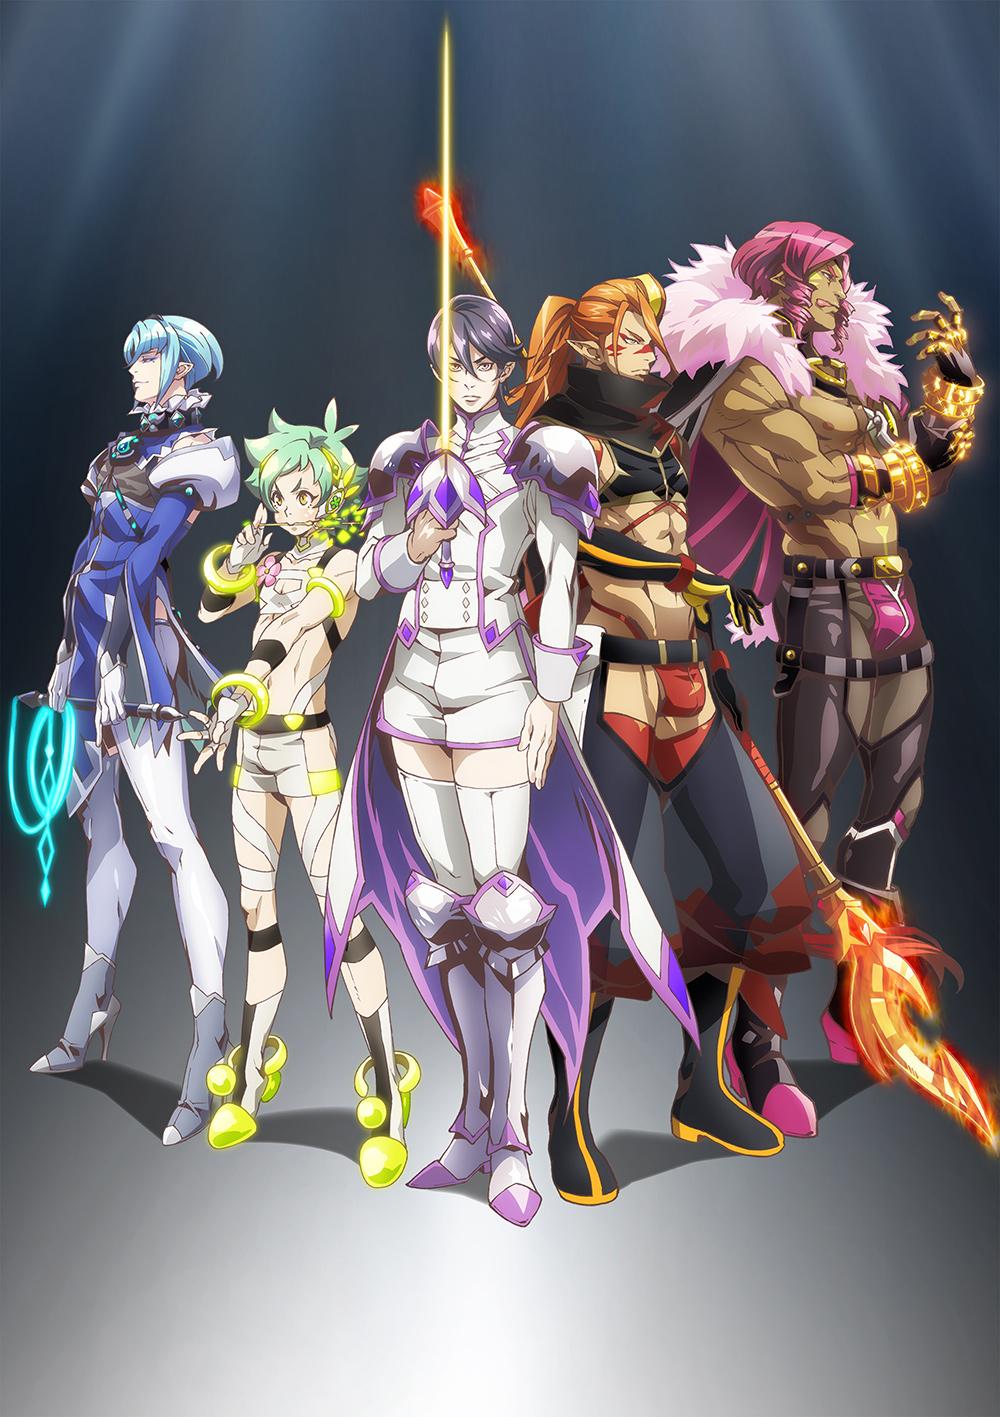 TVアニメ「Fairy蘭丸」変身後コスチュームに身を包んだ最新キービジュアル&1話あらすじ公開!